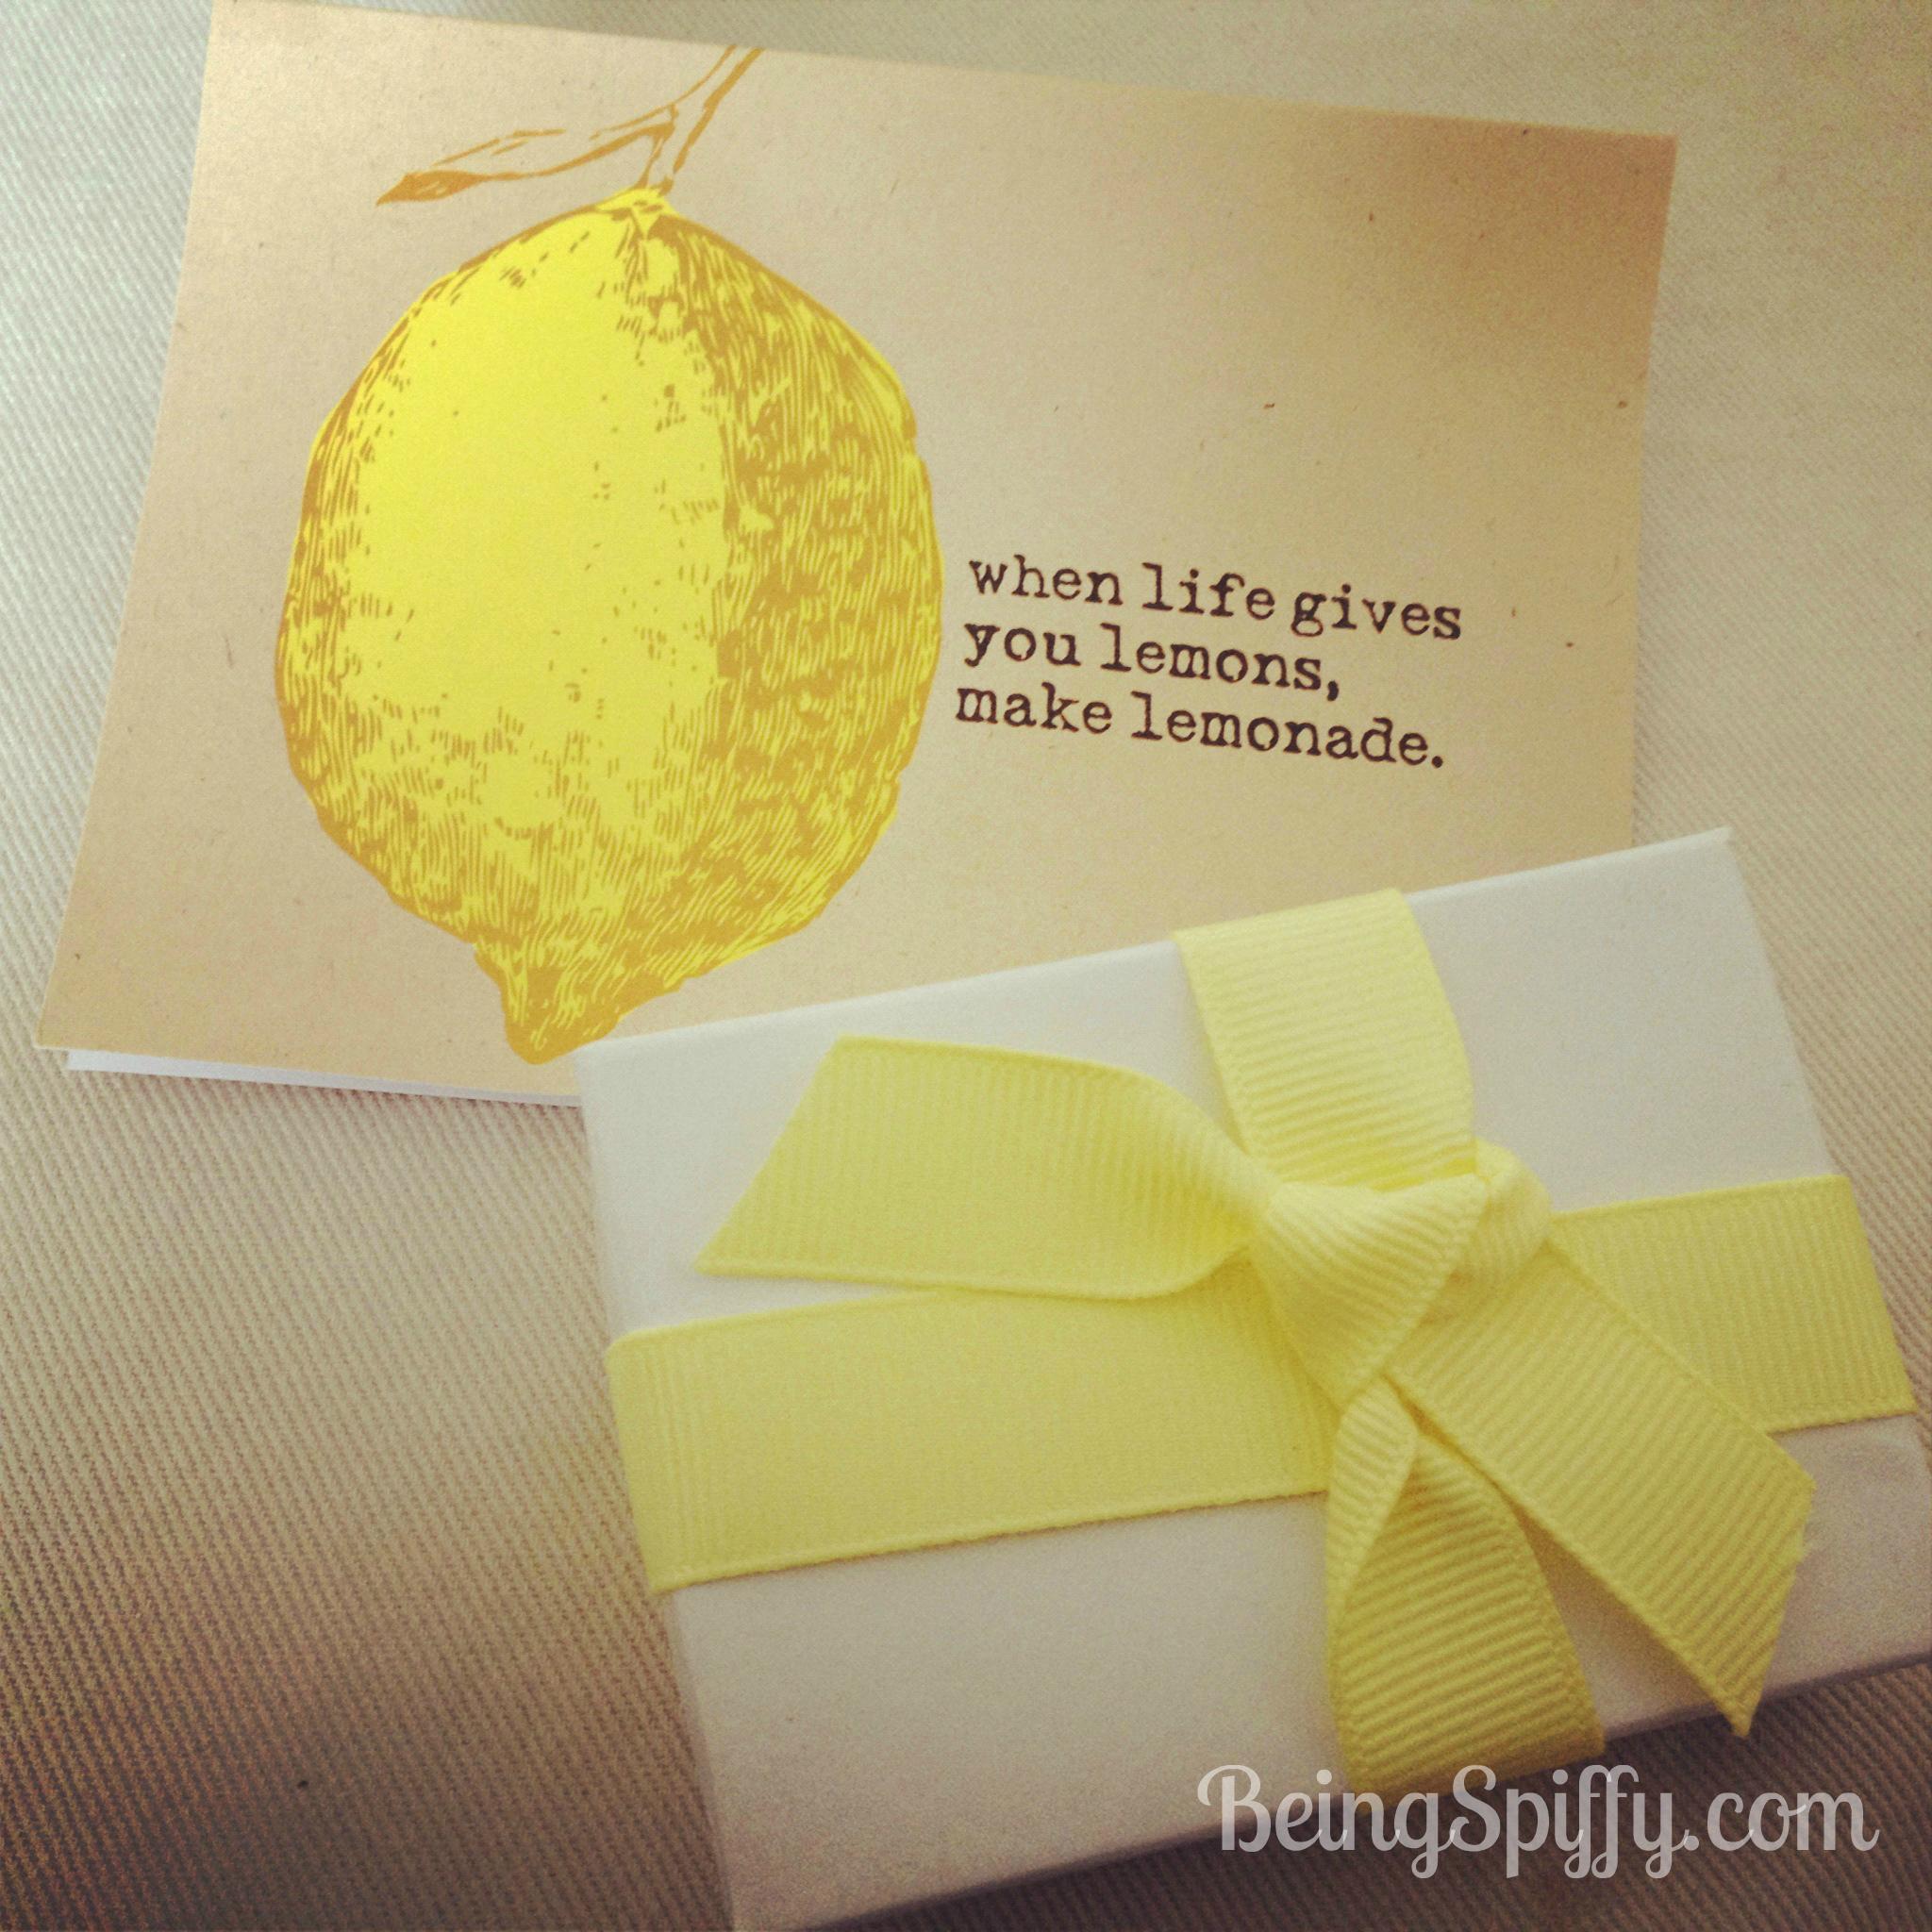 sassy_lemonade_package.jpg